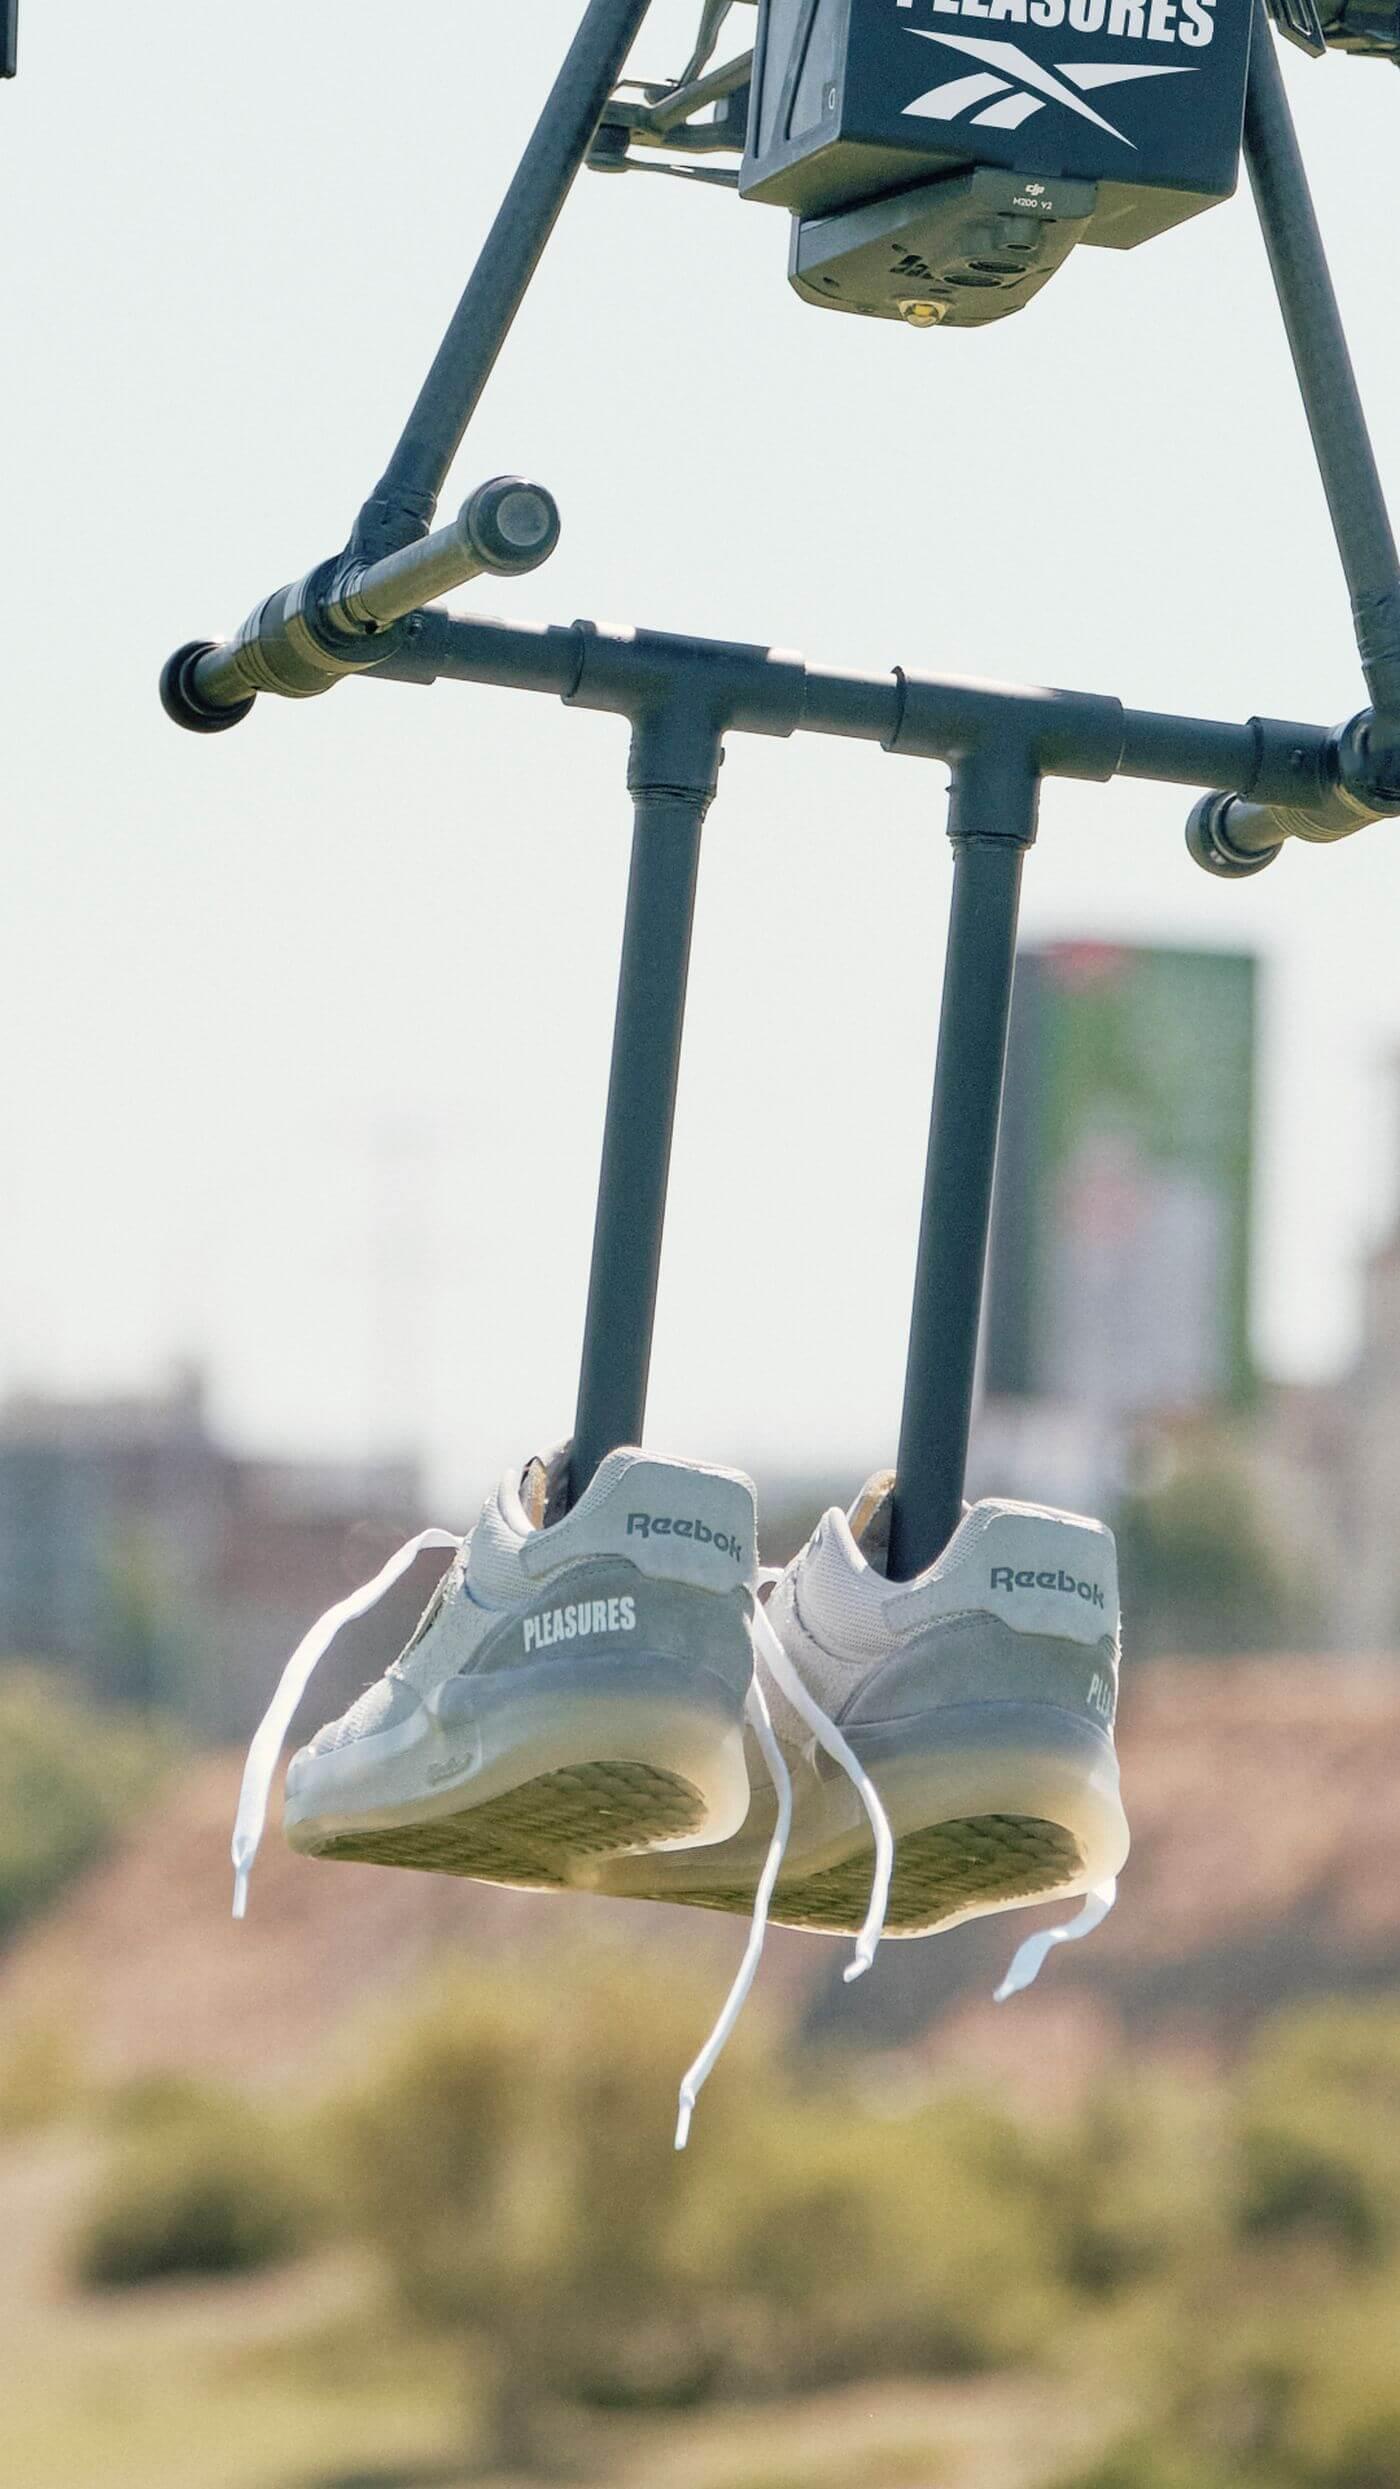 sneaker drone - Reebok x Pleasures - Club C Legacy - pure grey 2 / pure grey 4 /straw - GW2639